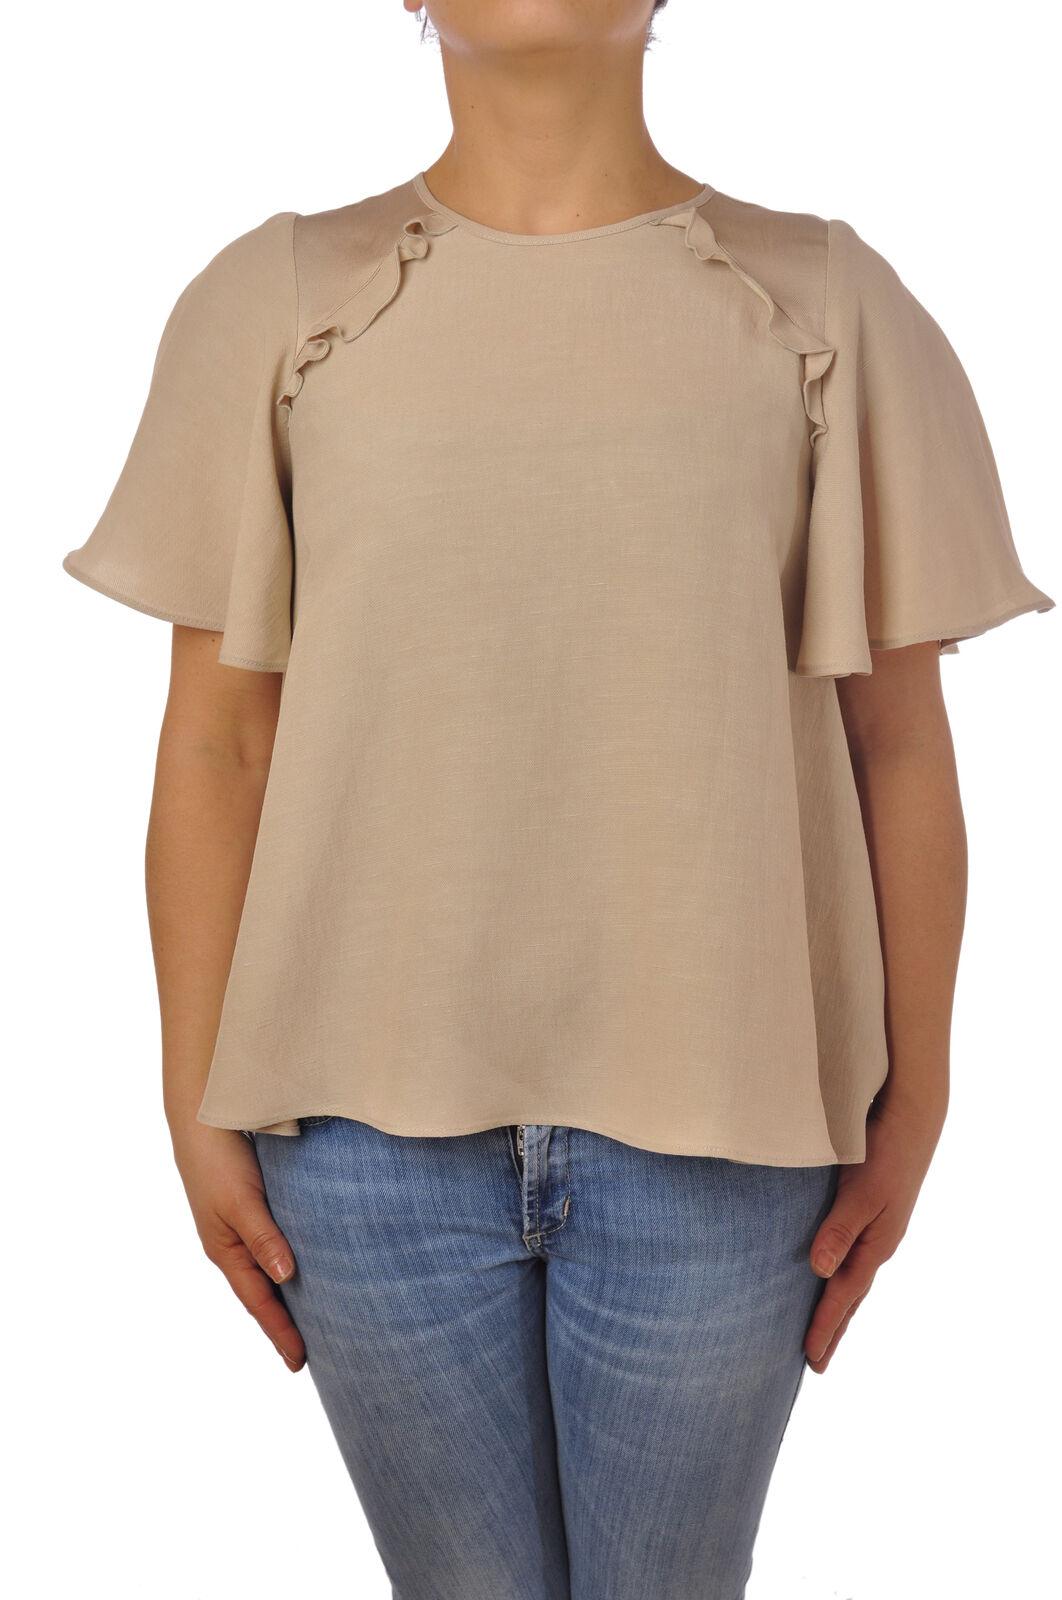 Twin Set - Shirts-Blouses - Woman - Beige - 5106822F180630